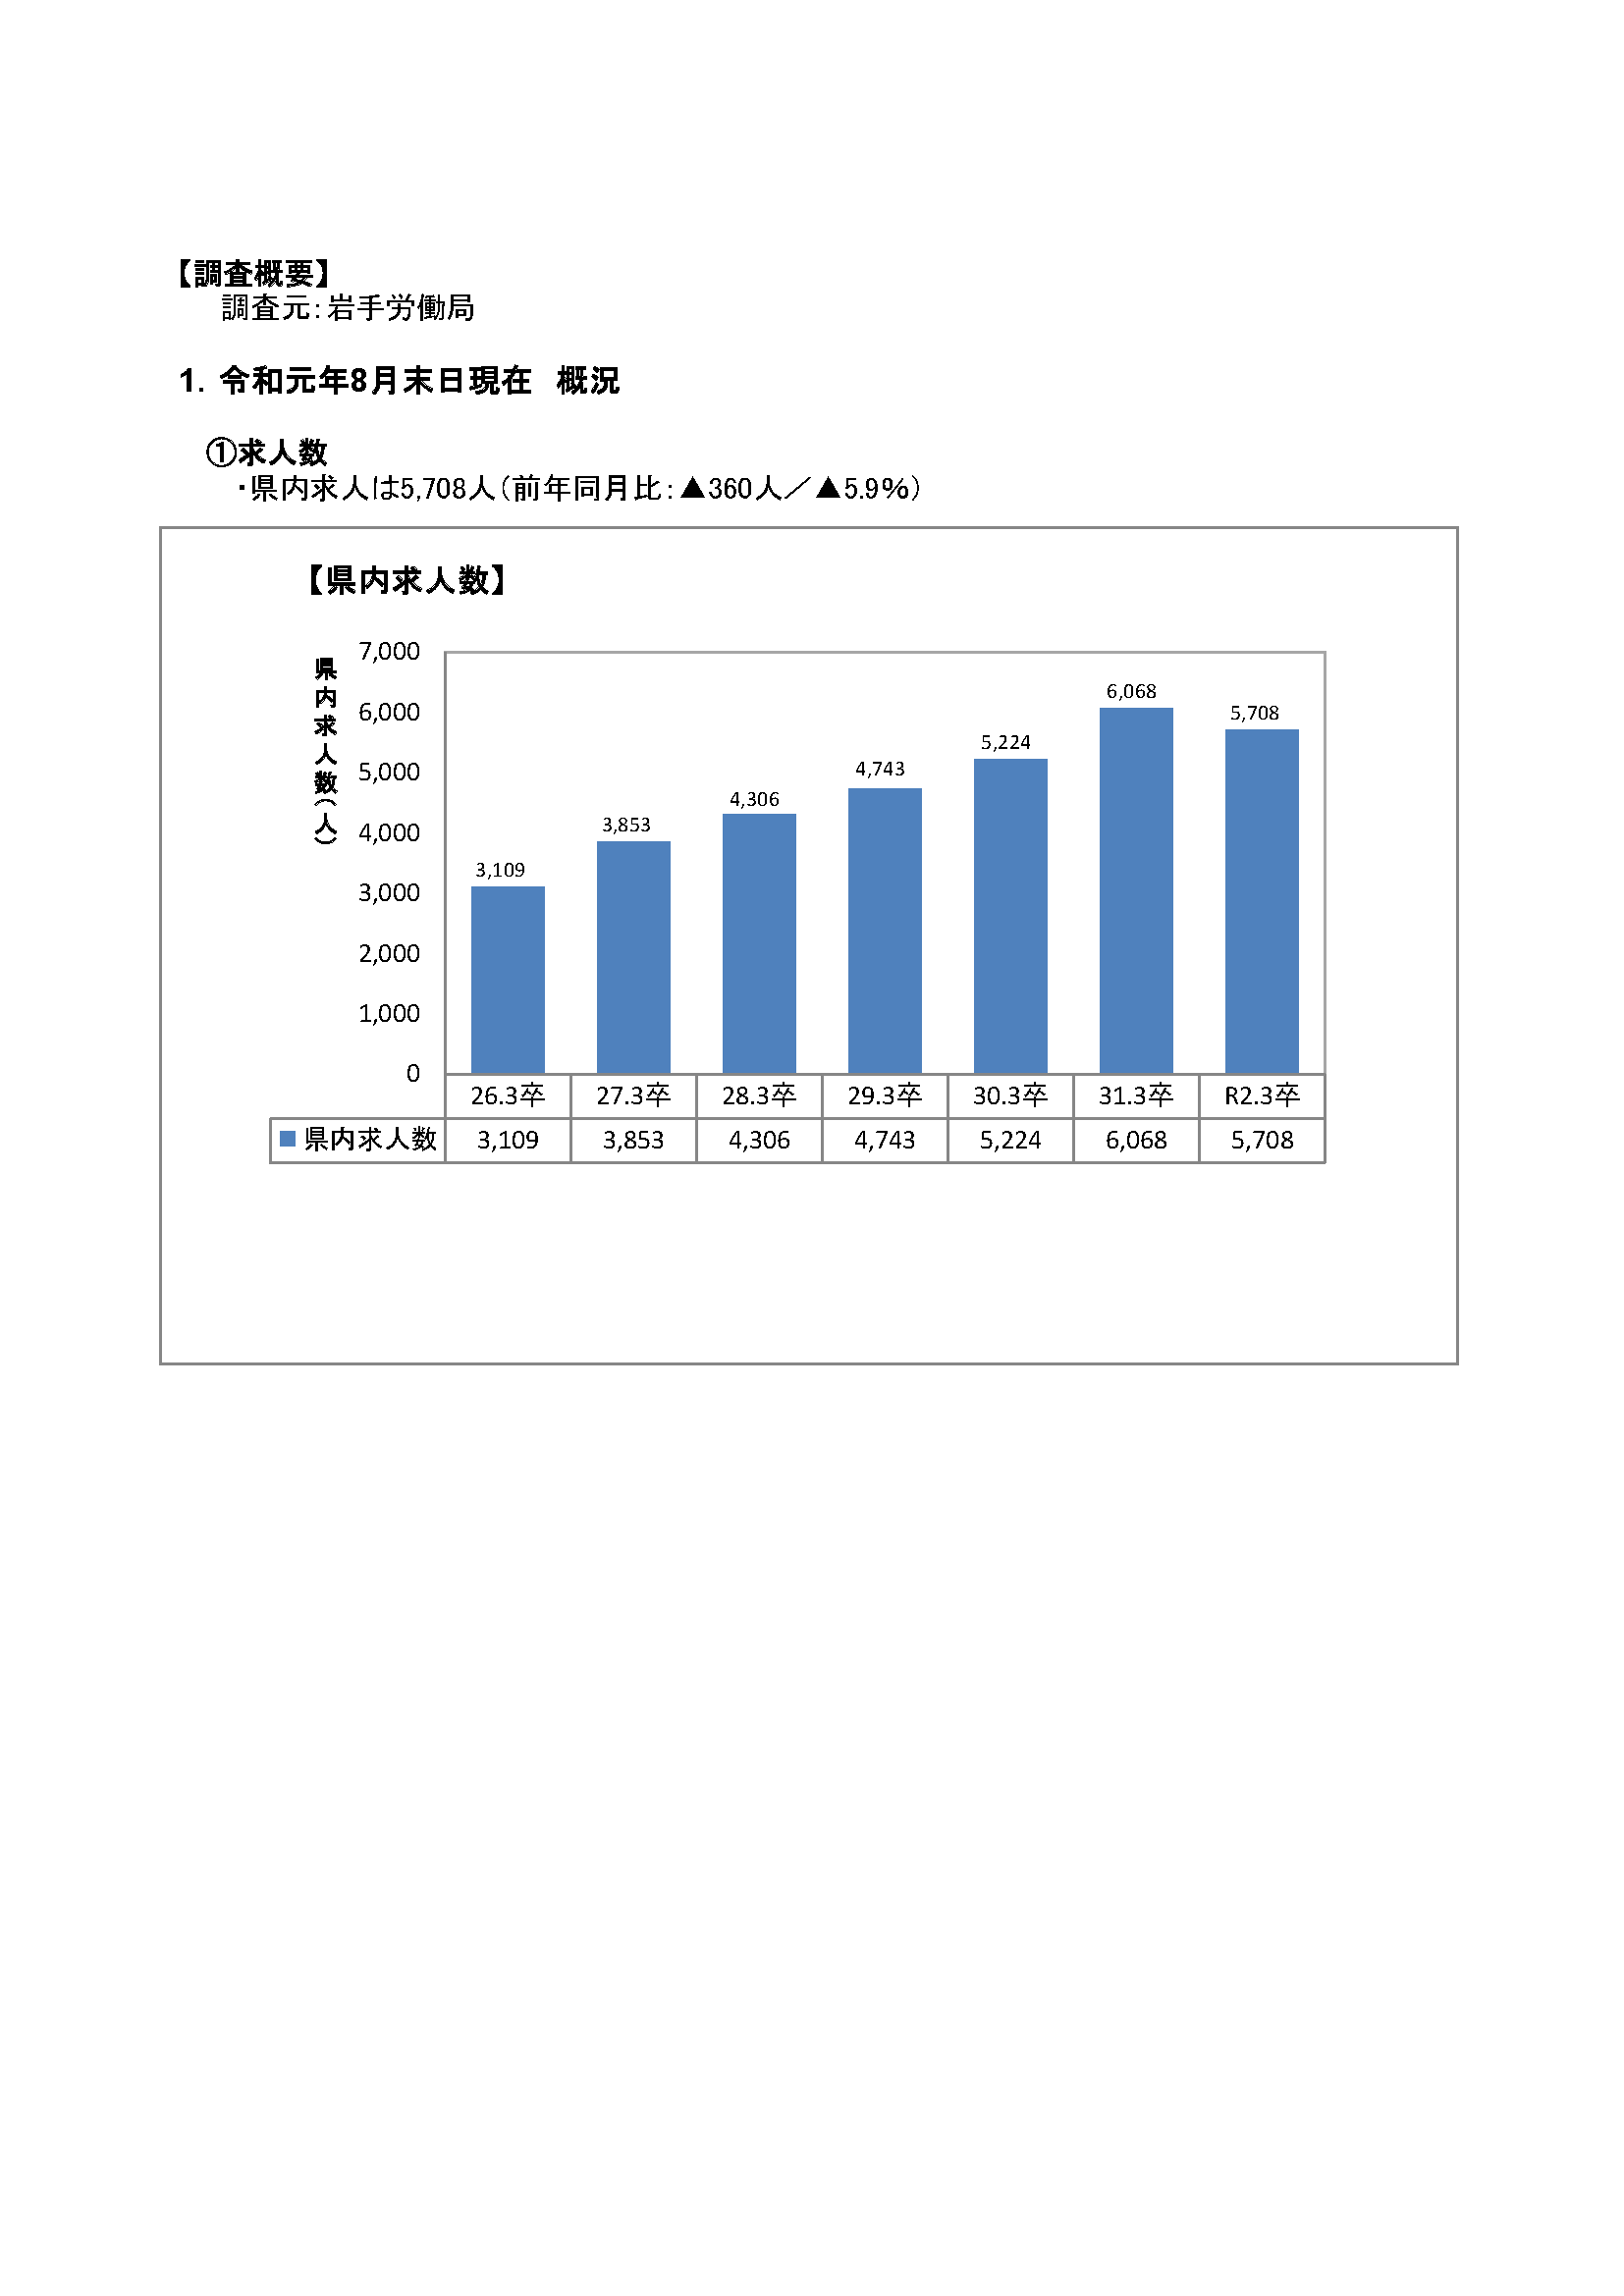 R2.3月高卒者職業紹介状況資料(201908月末現在)